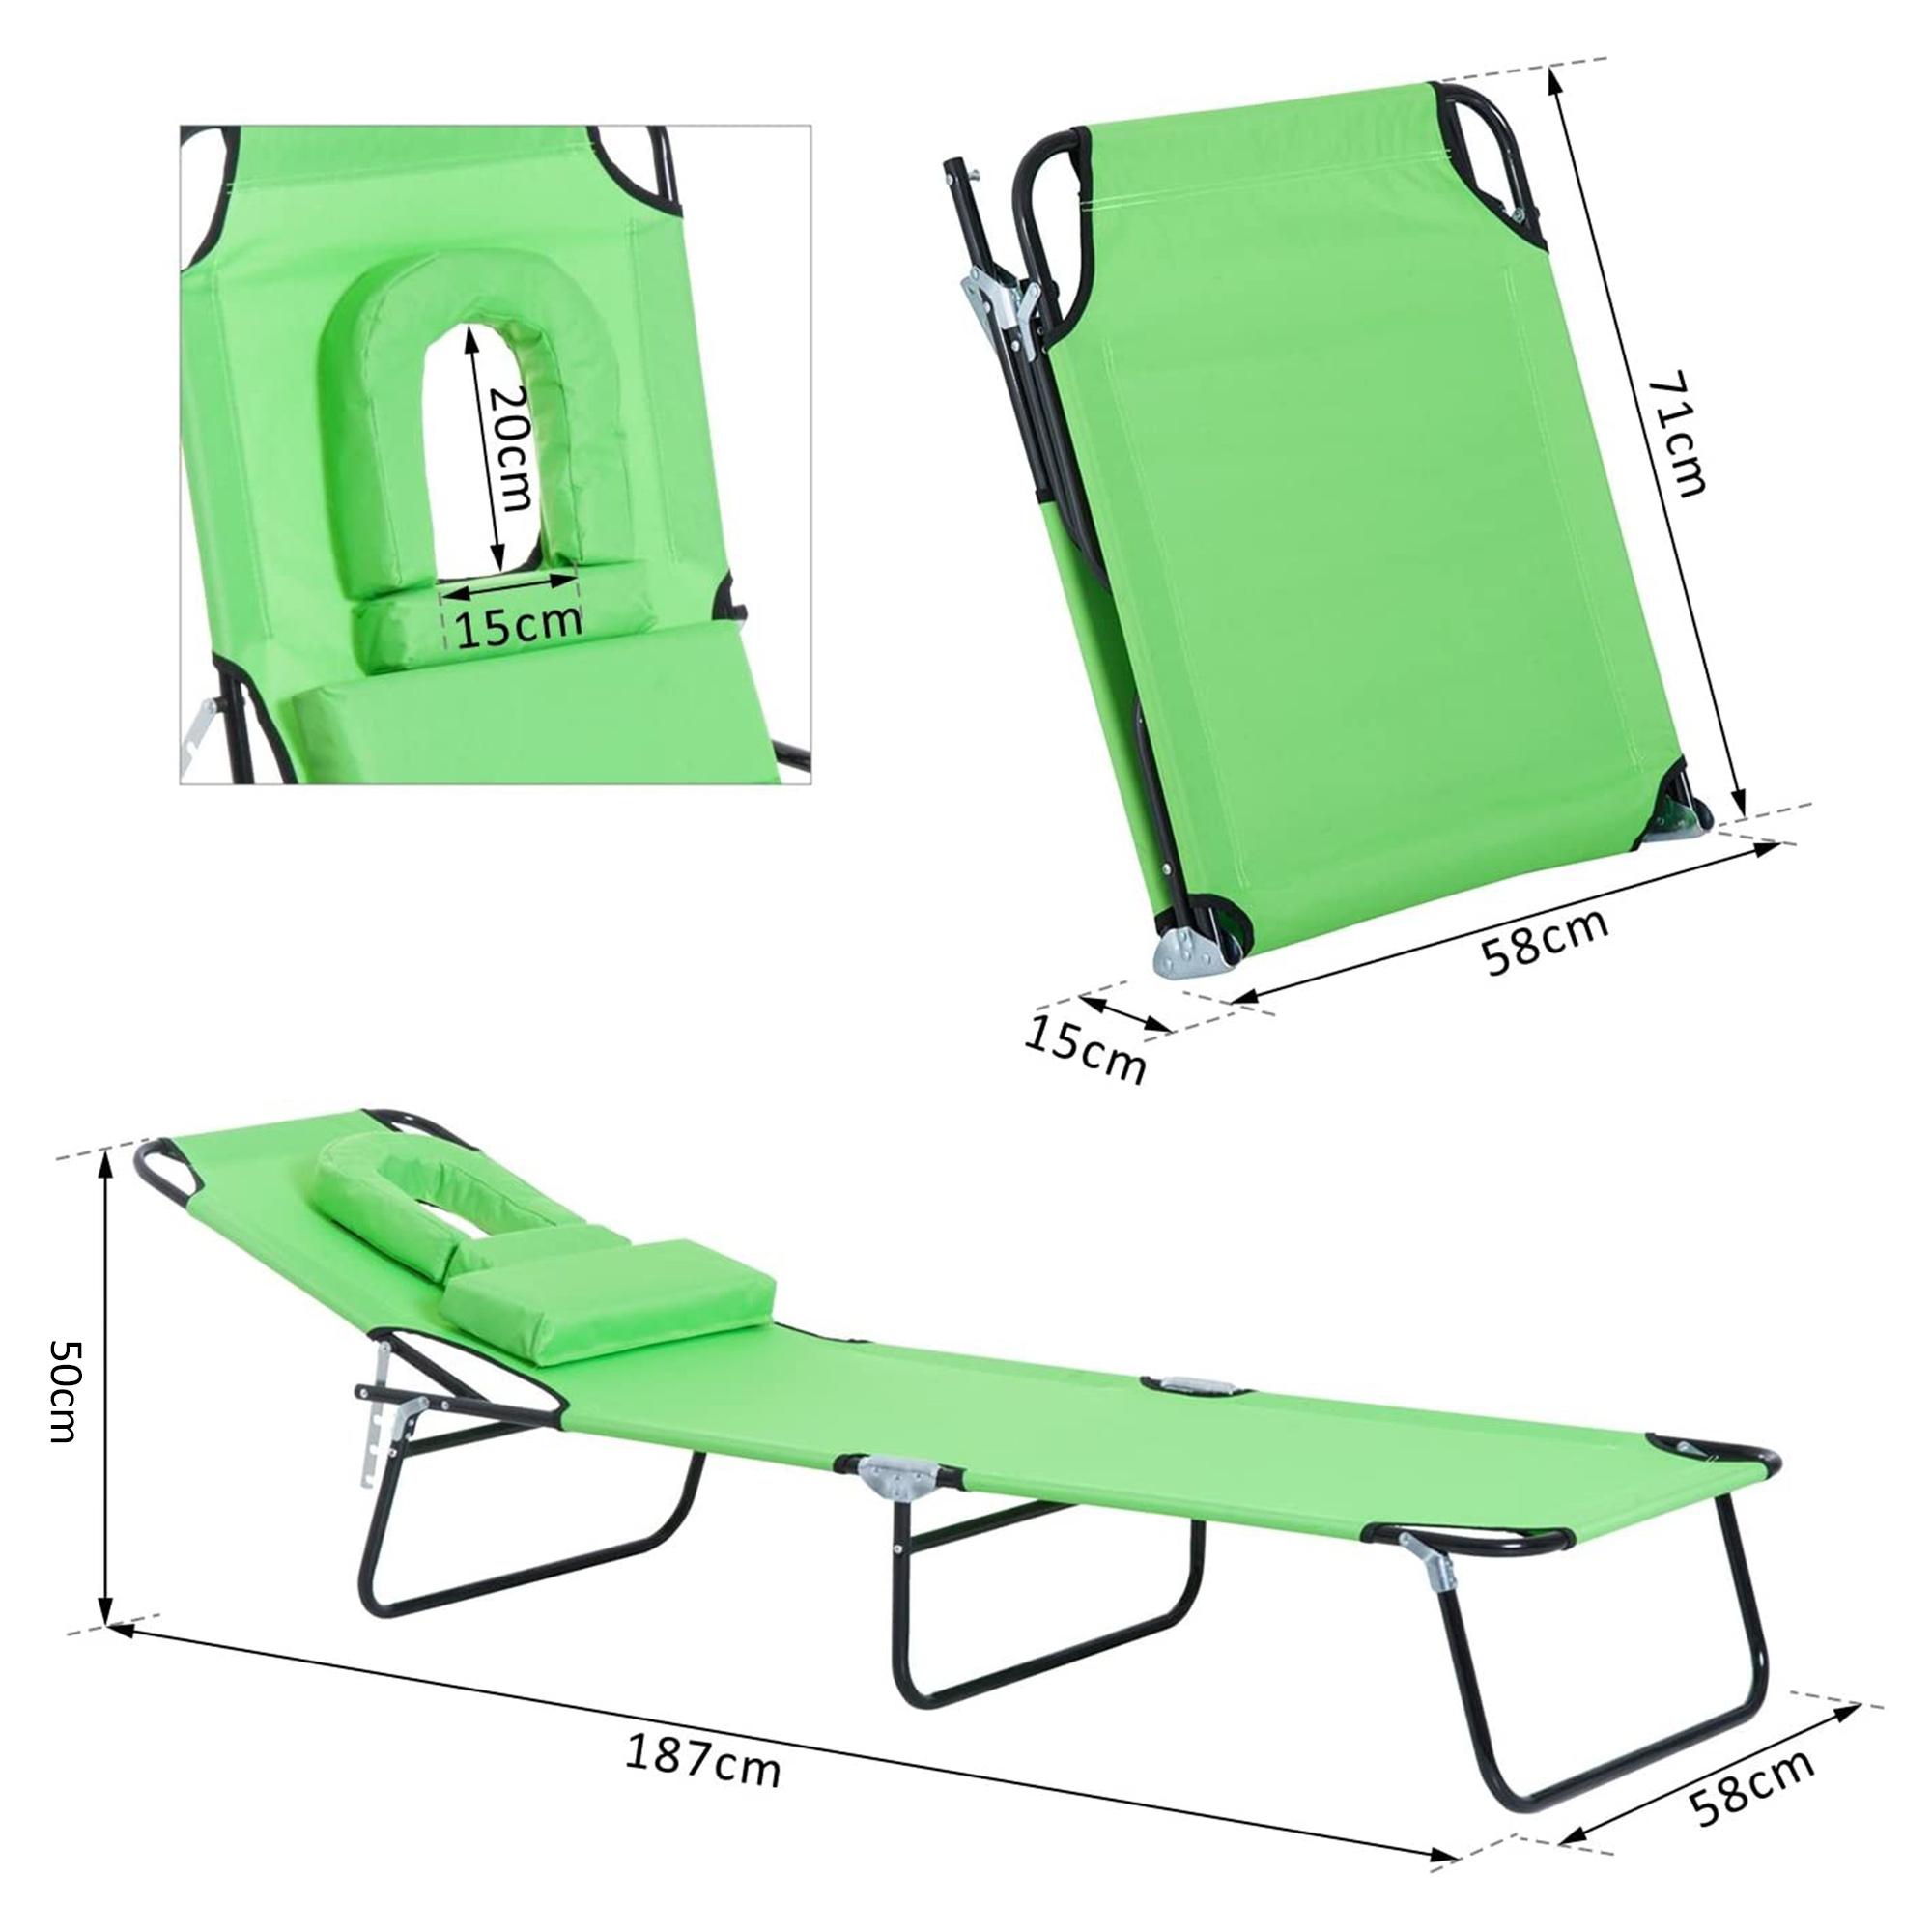 miniatura 22 - Silla Reclinable Plegable Tumbona Reclinable Jardín Al Aire Libre Portátil Asiento Cama